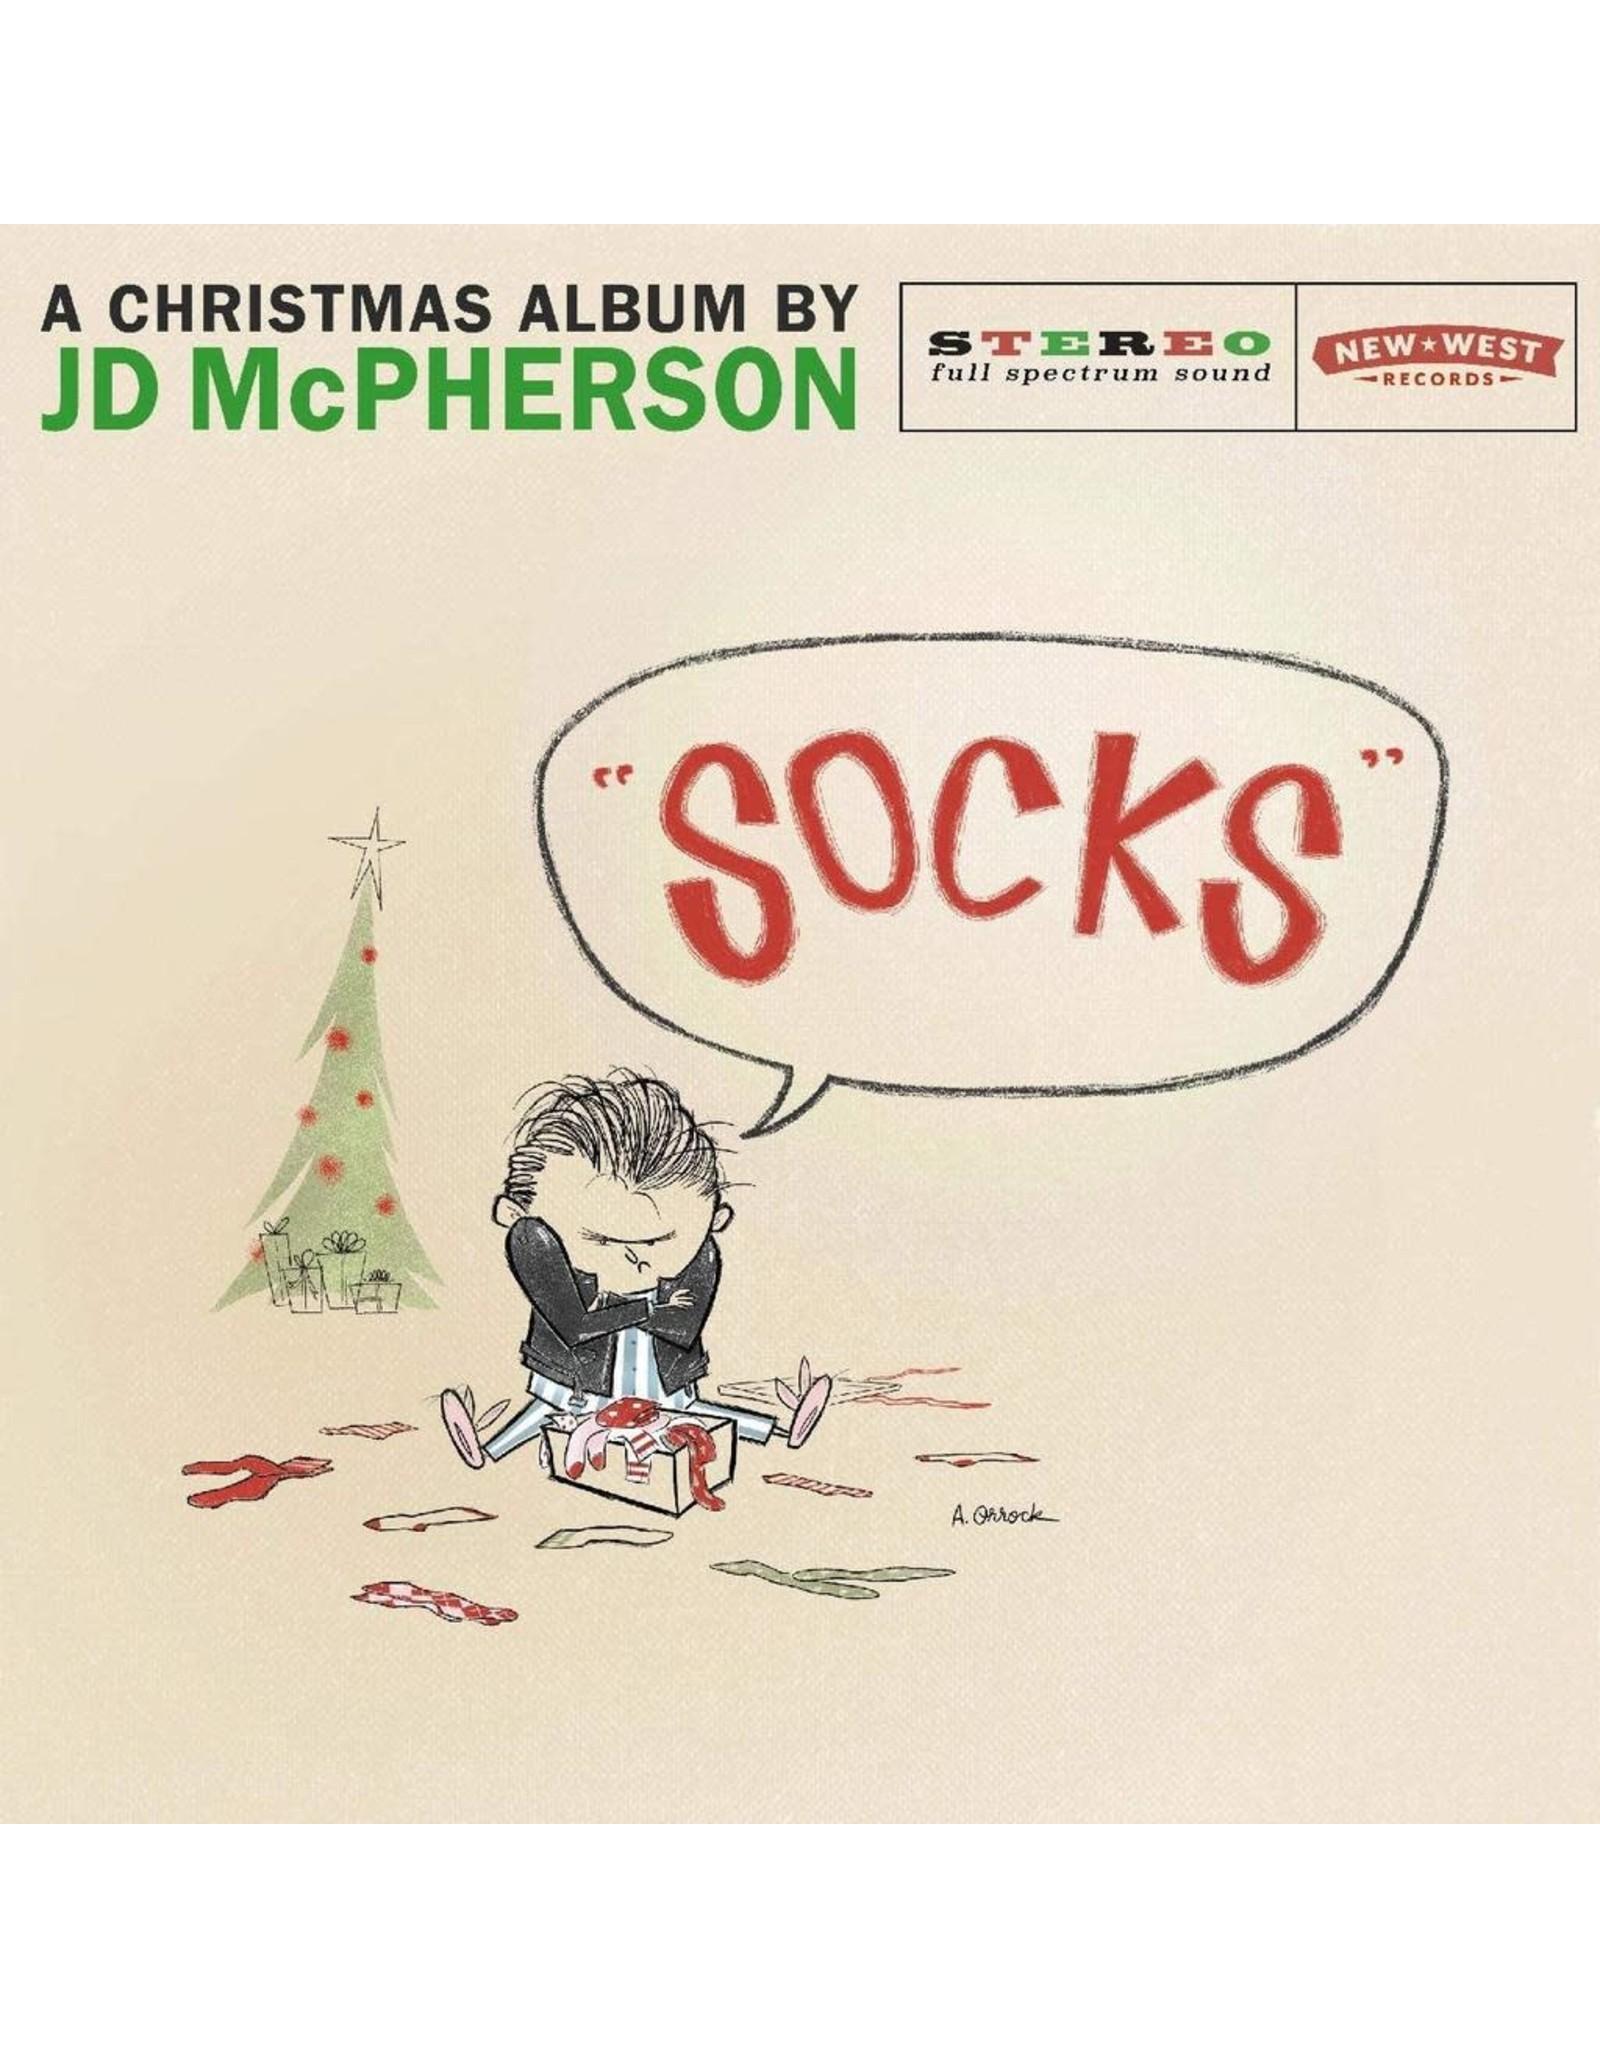 JD McPherson - Socks (Exclusive Snowglobe Vinyl)